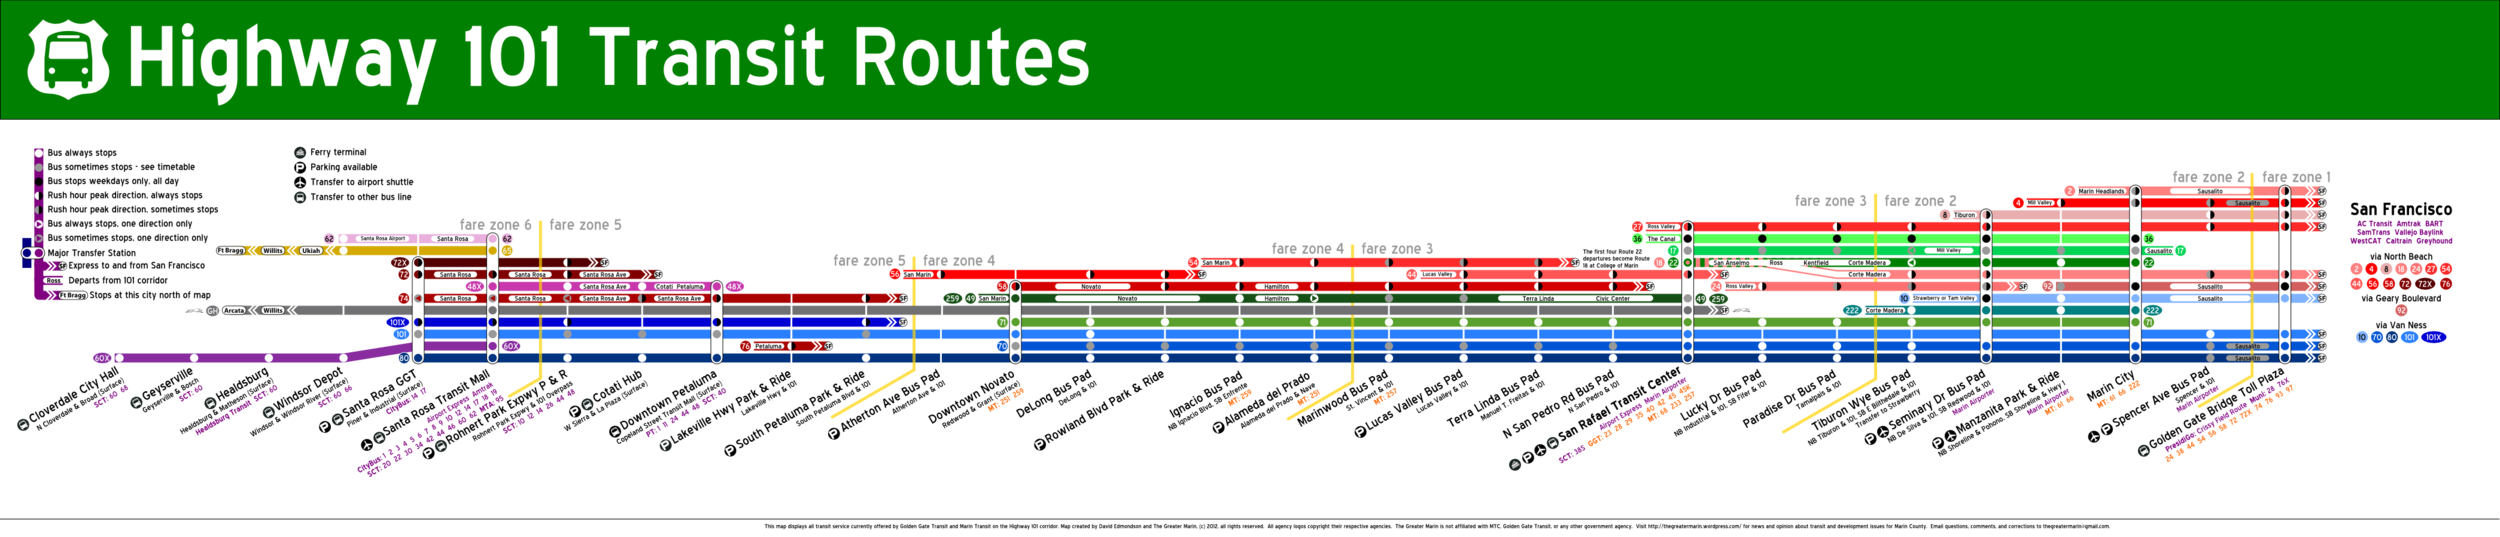 101 Buses-Weekday 2013.08-x